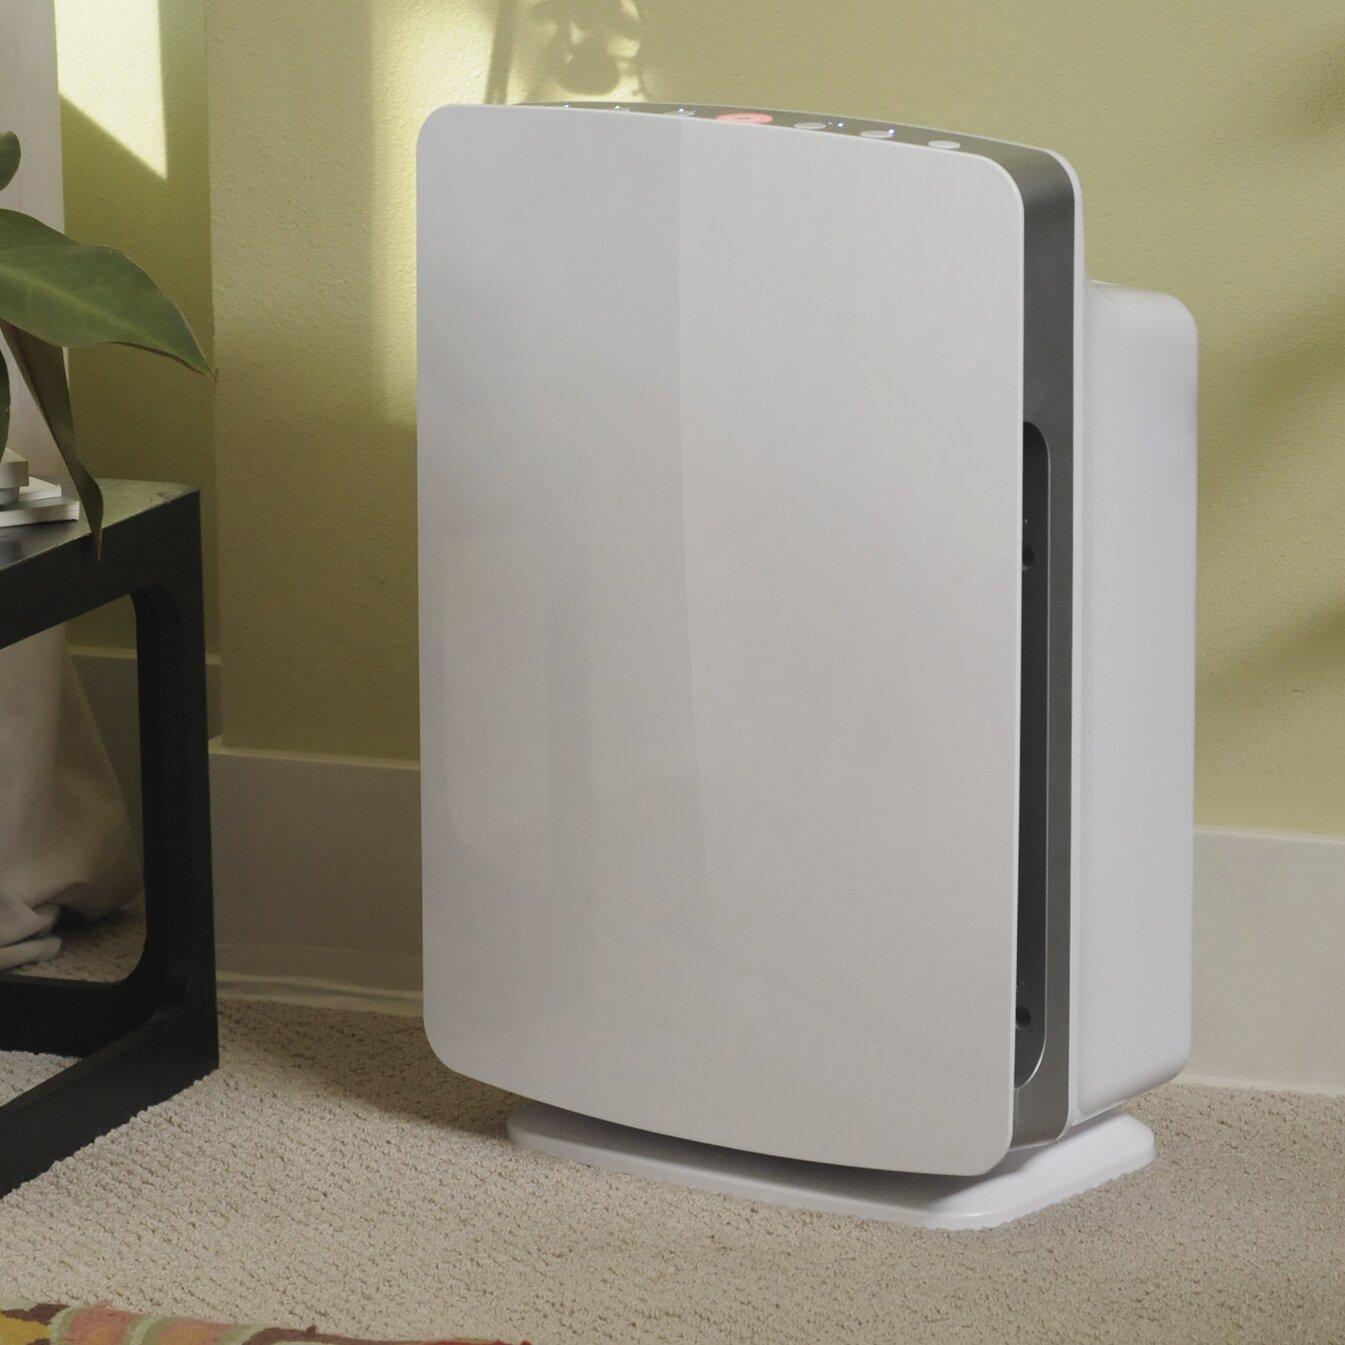 Alen Breathesmart Room Hepa Air Purifier Reviews Wayfair